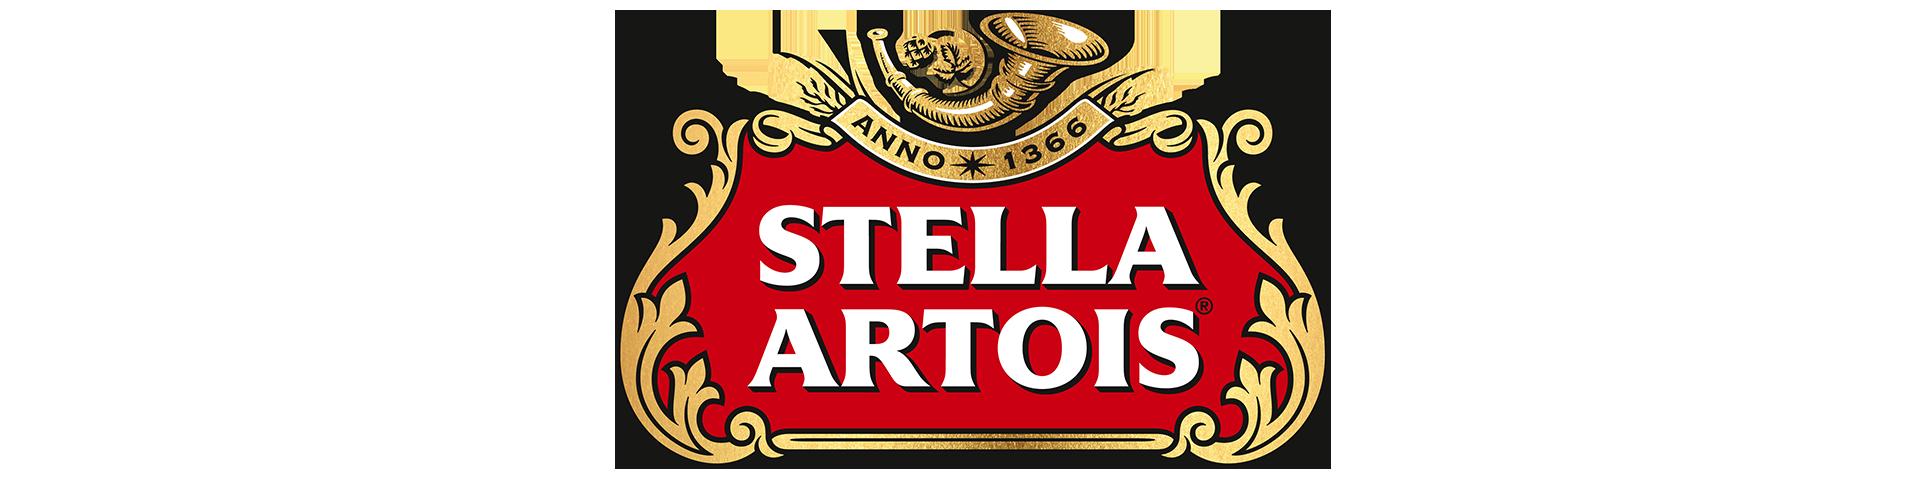 Stella artois Logos.